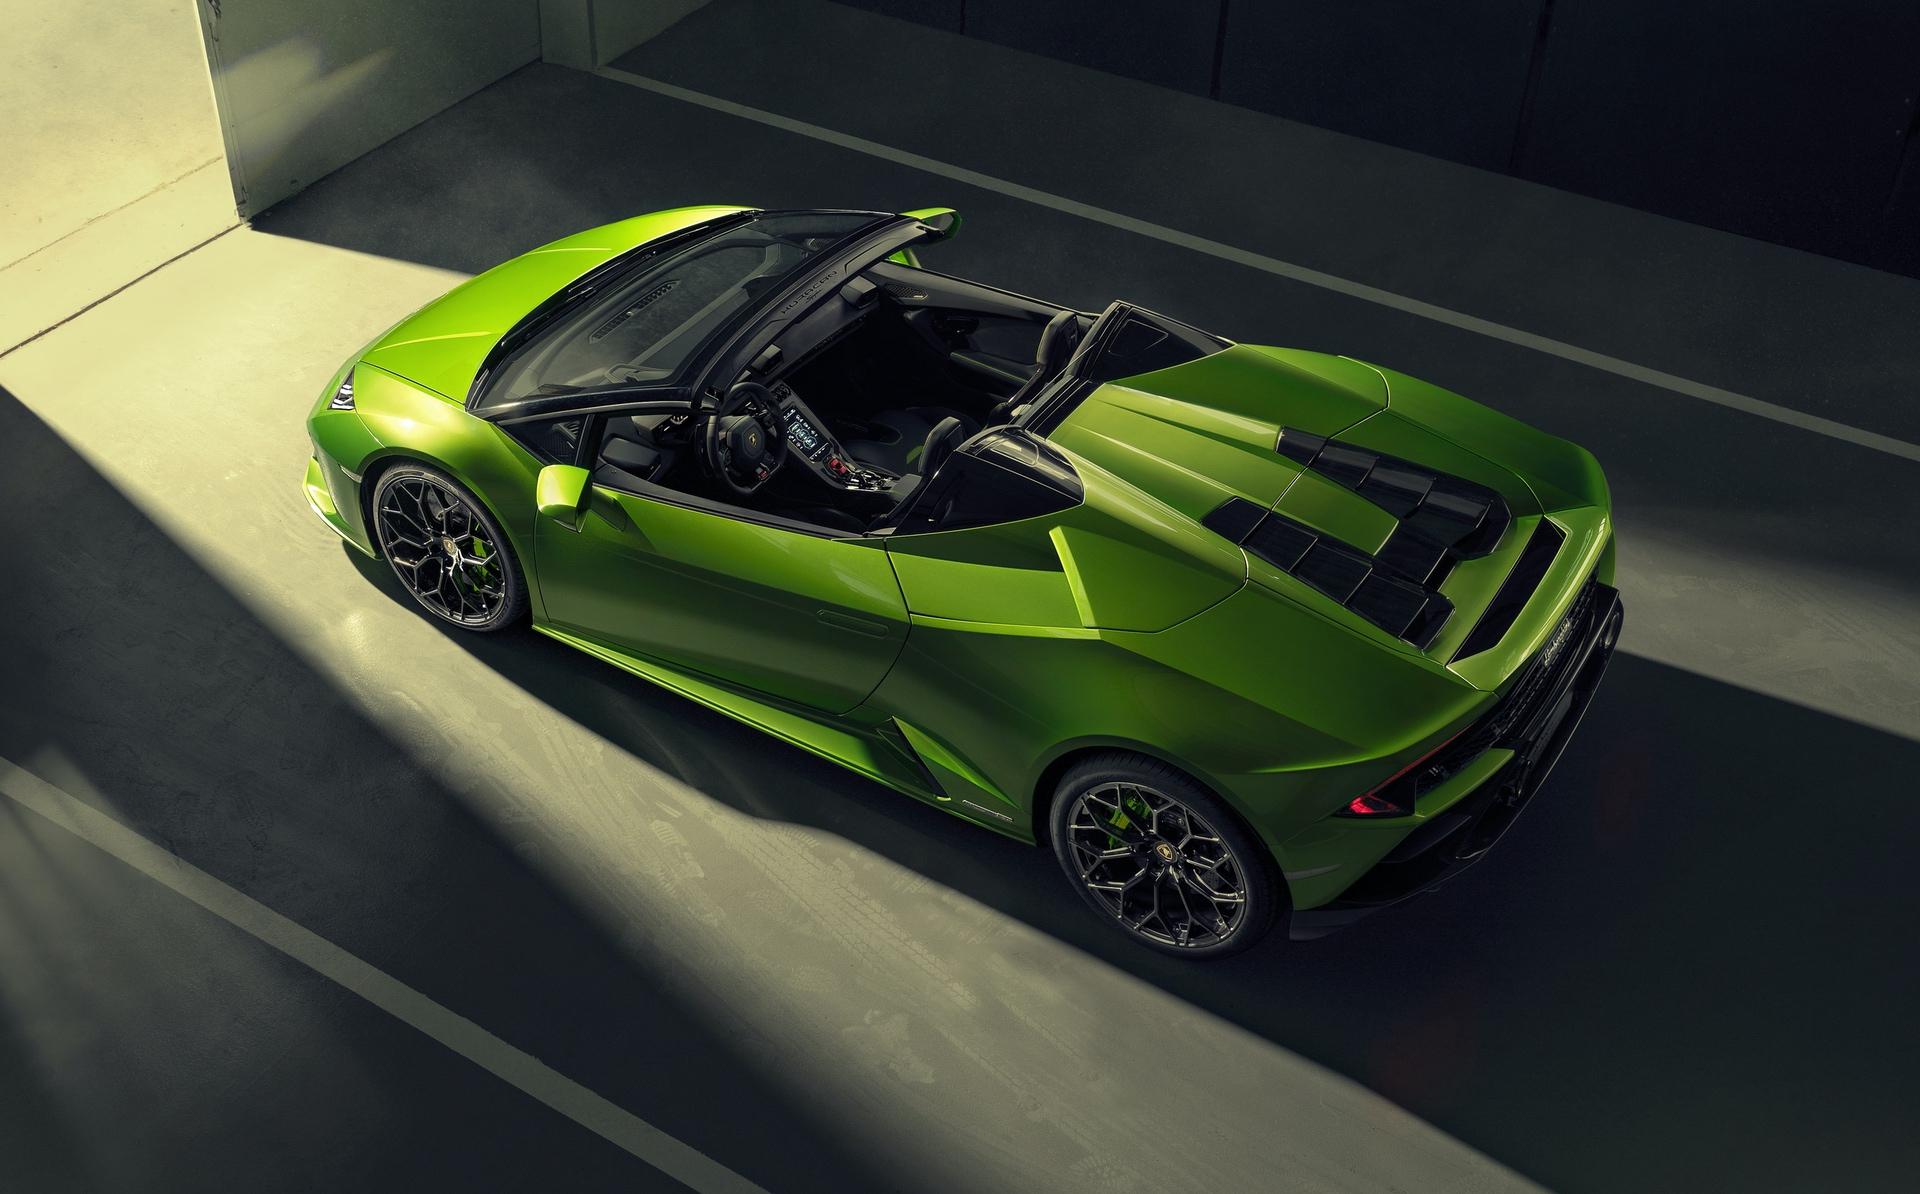 Lamborghini_Huracan_Evo_Spyder_0016